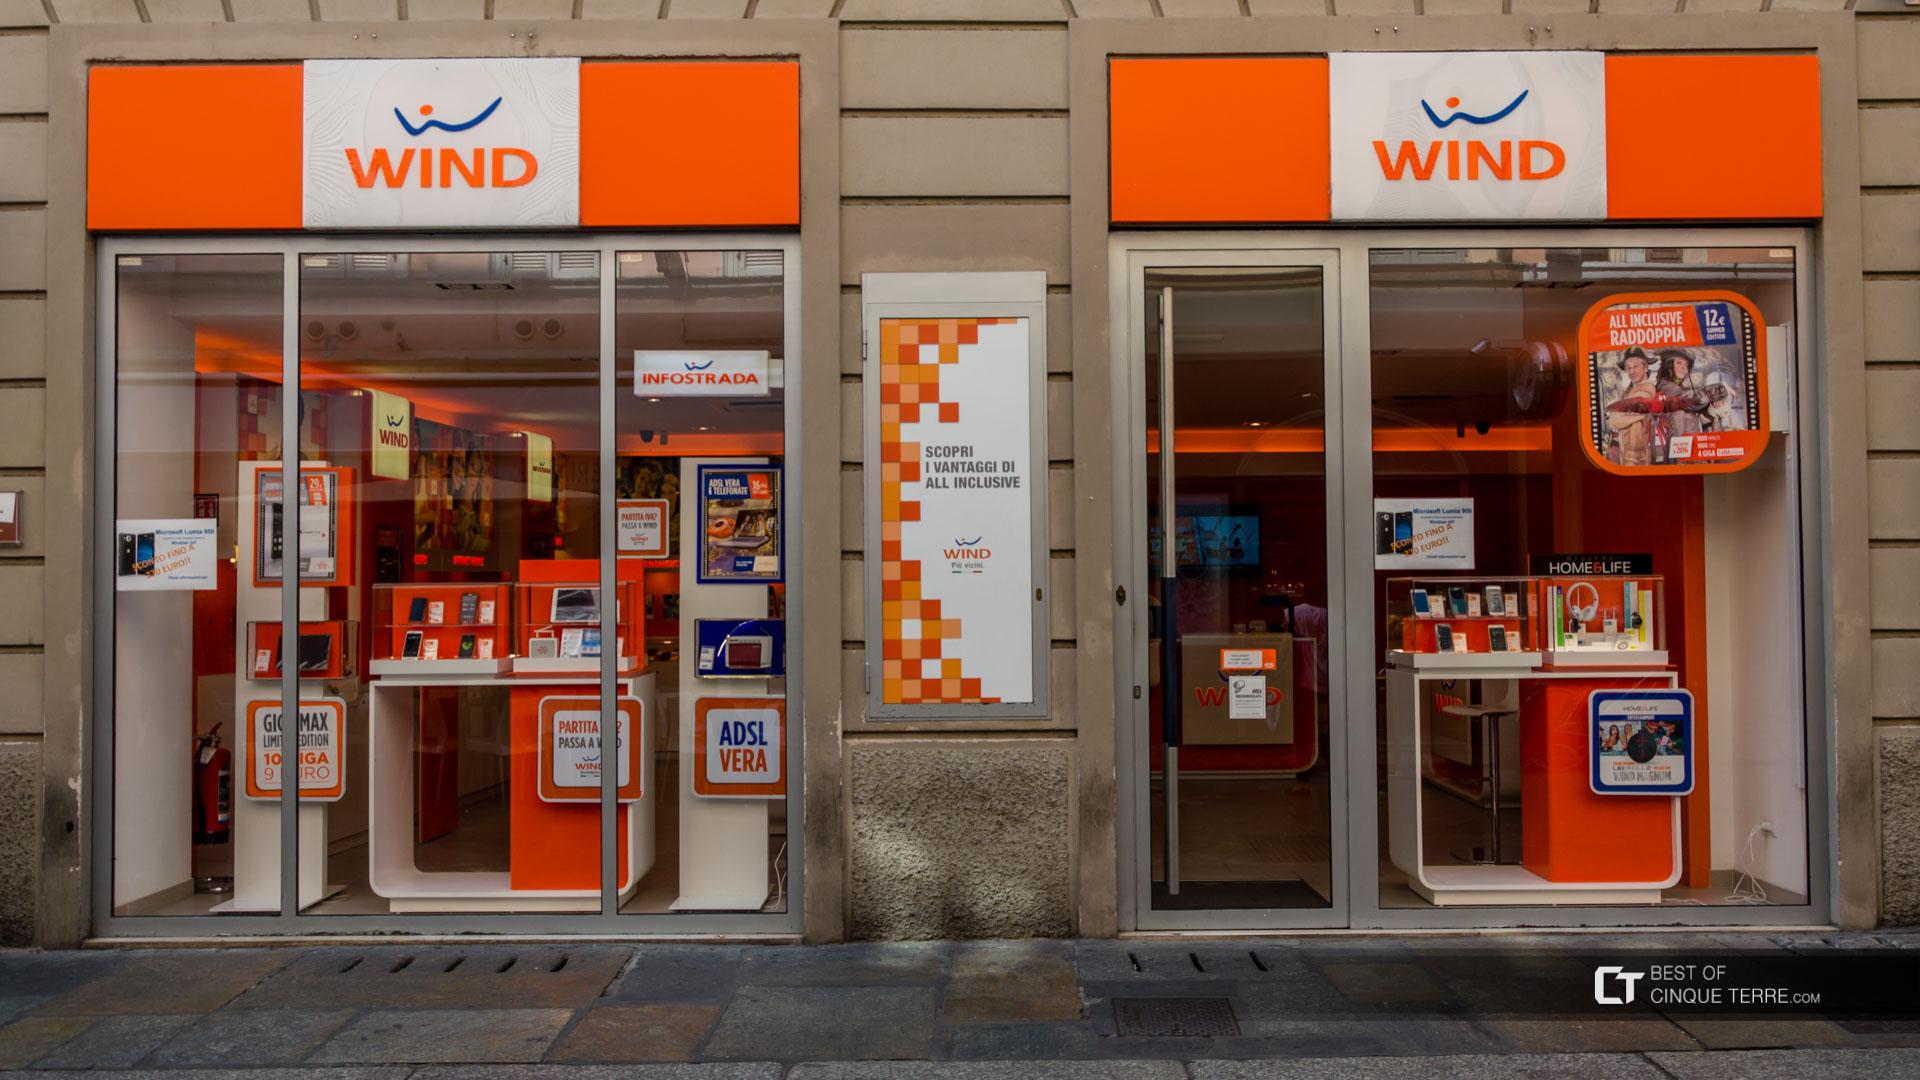 Wind mobile sim